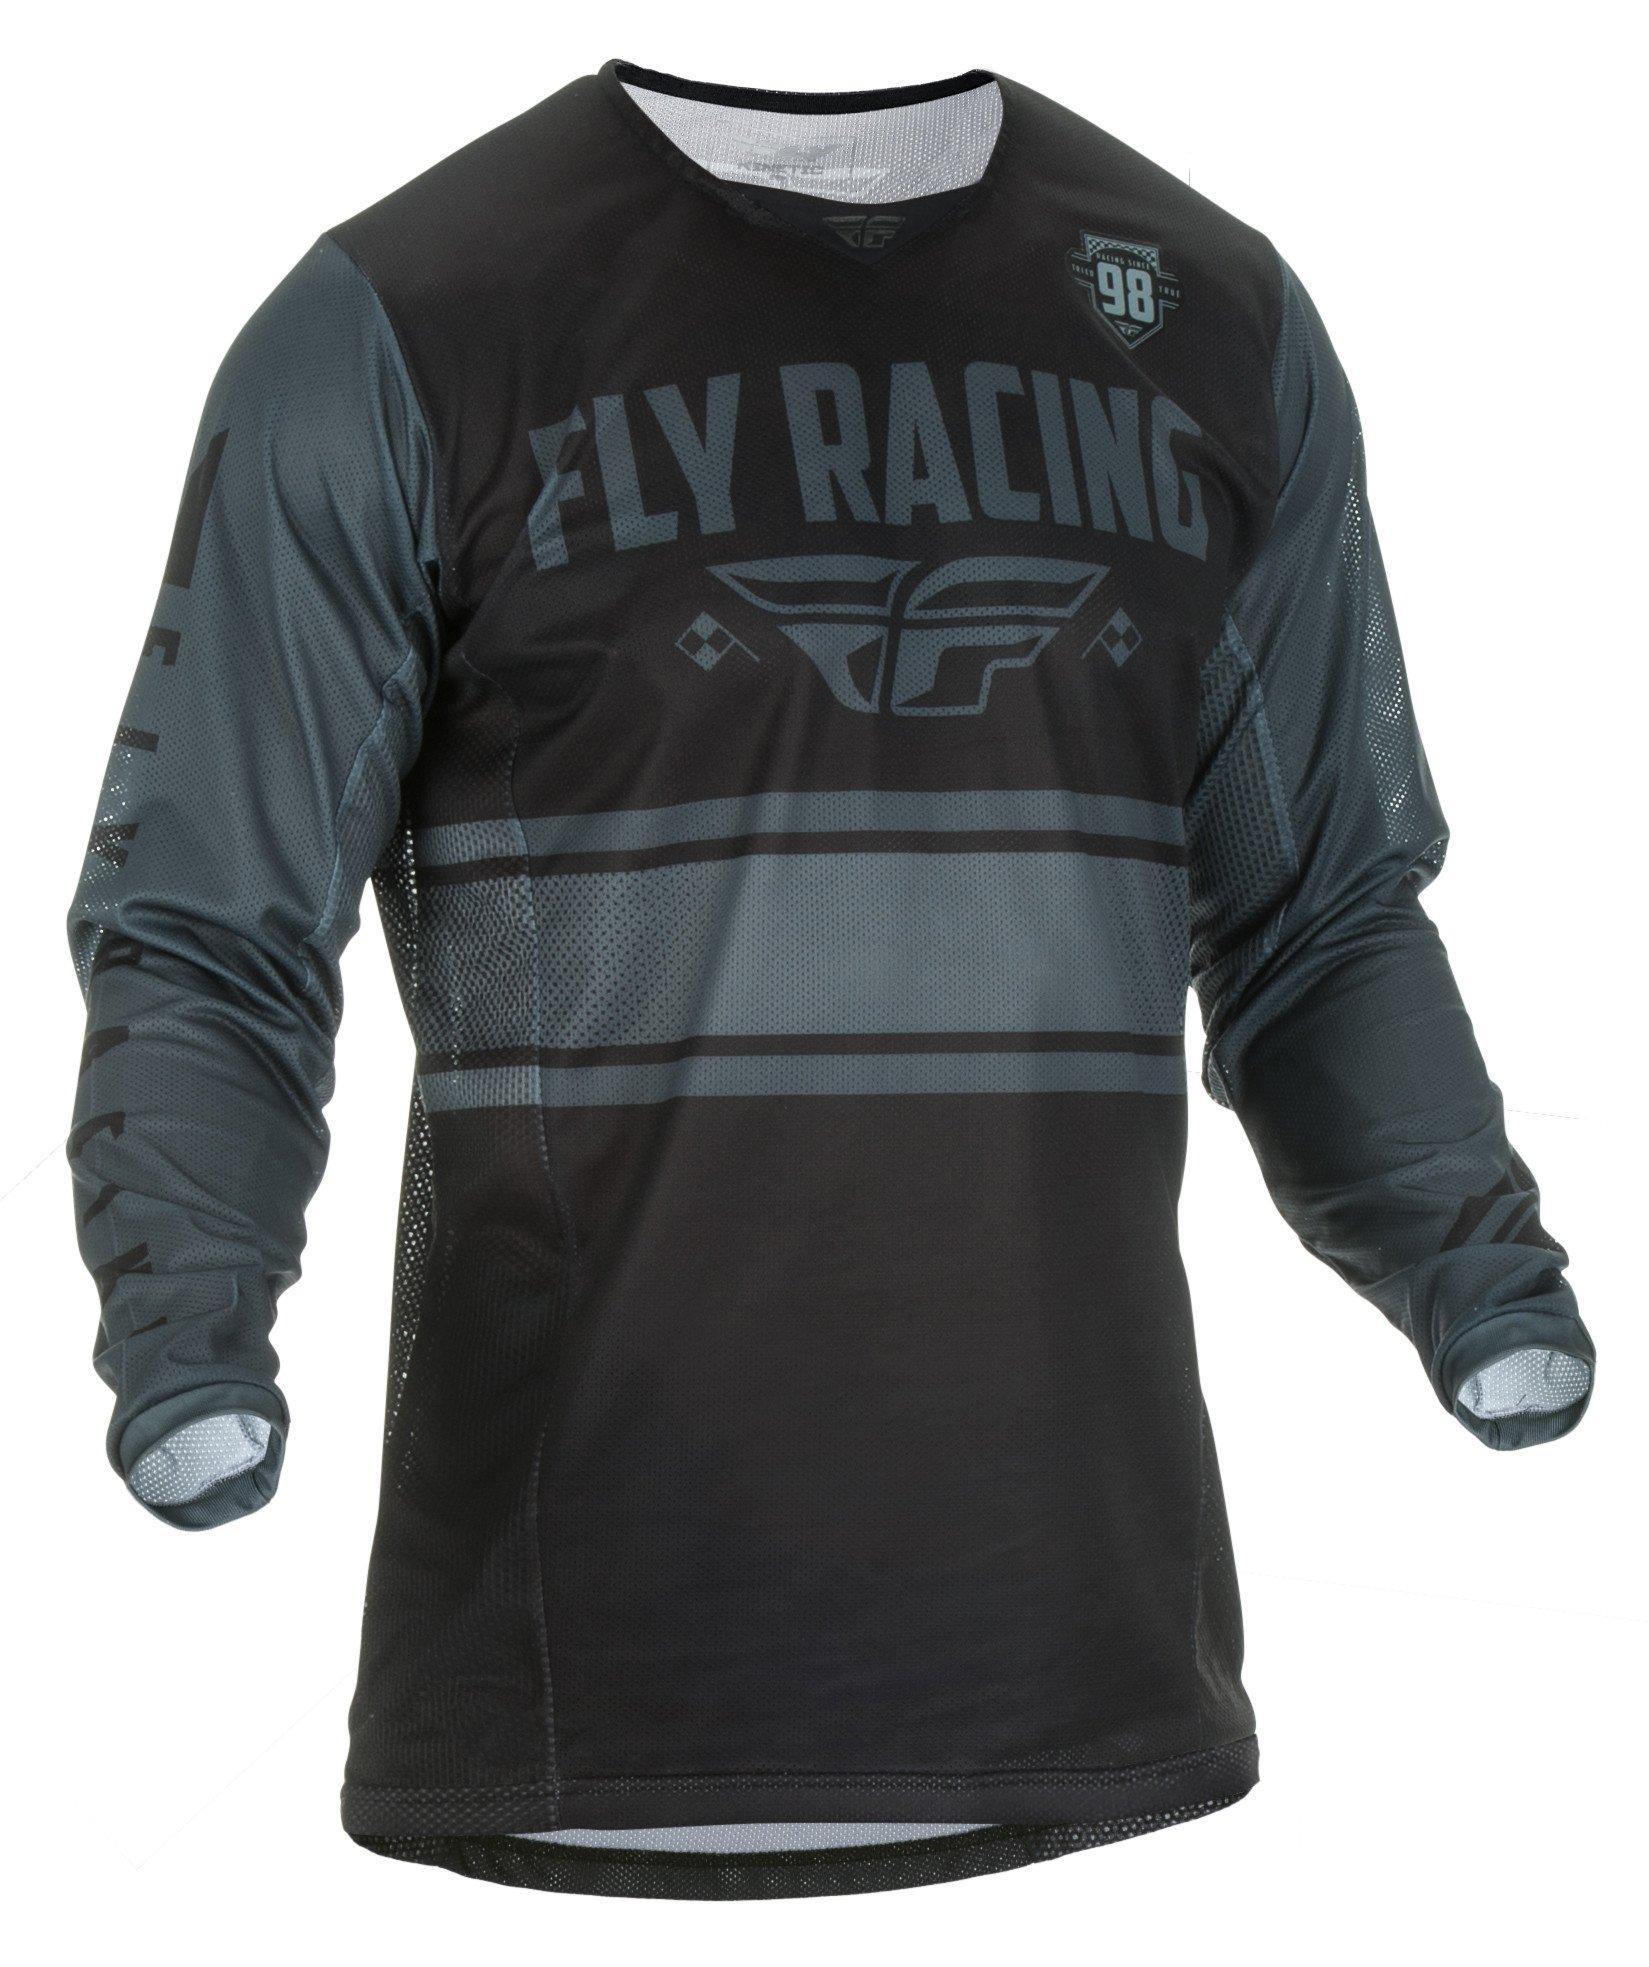 Fly Racing Men's Kinetic Mesh Era Jersey(Black/Grey, Large),1 Pack